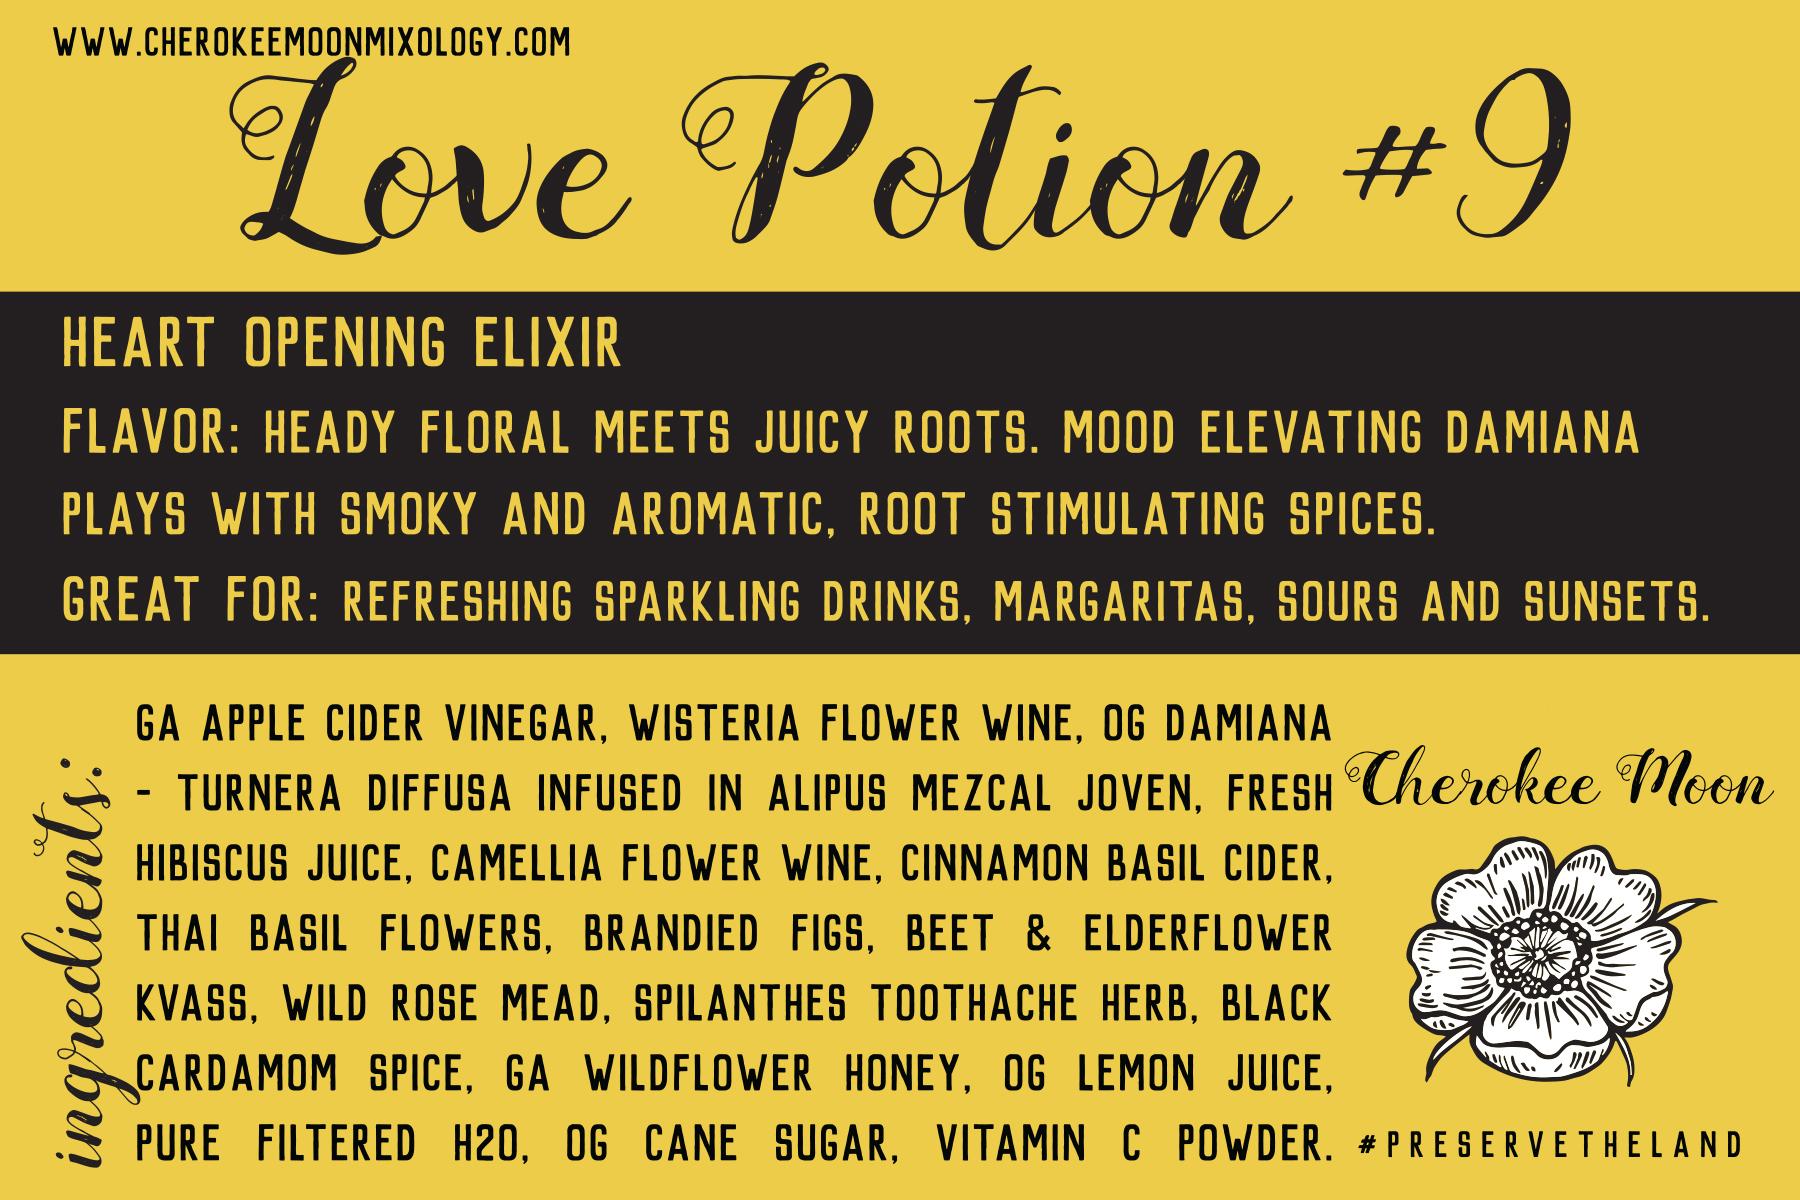 IC- Love Potion #9.jpg